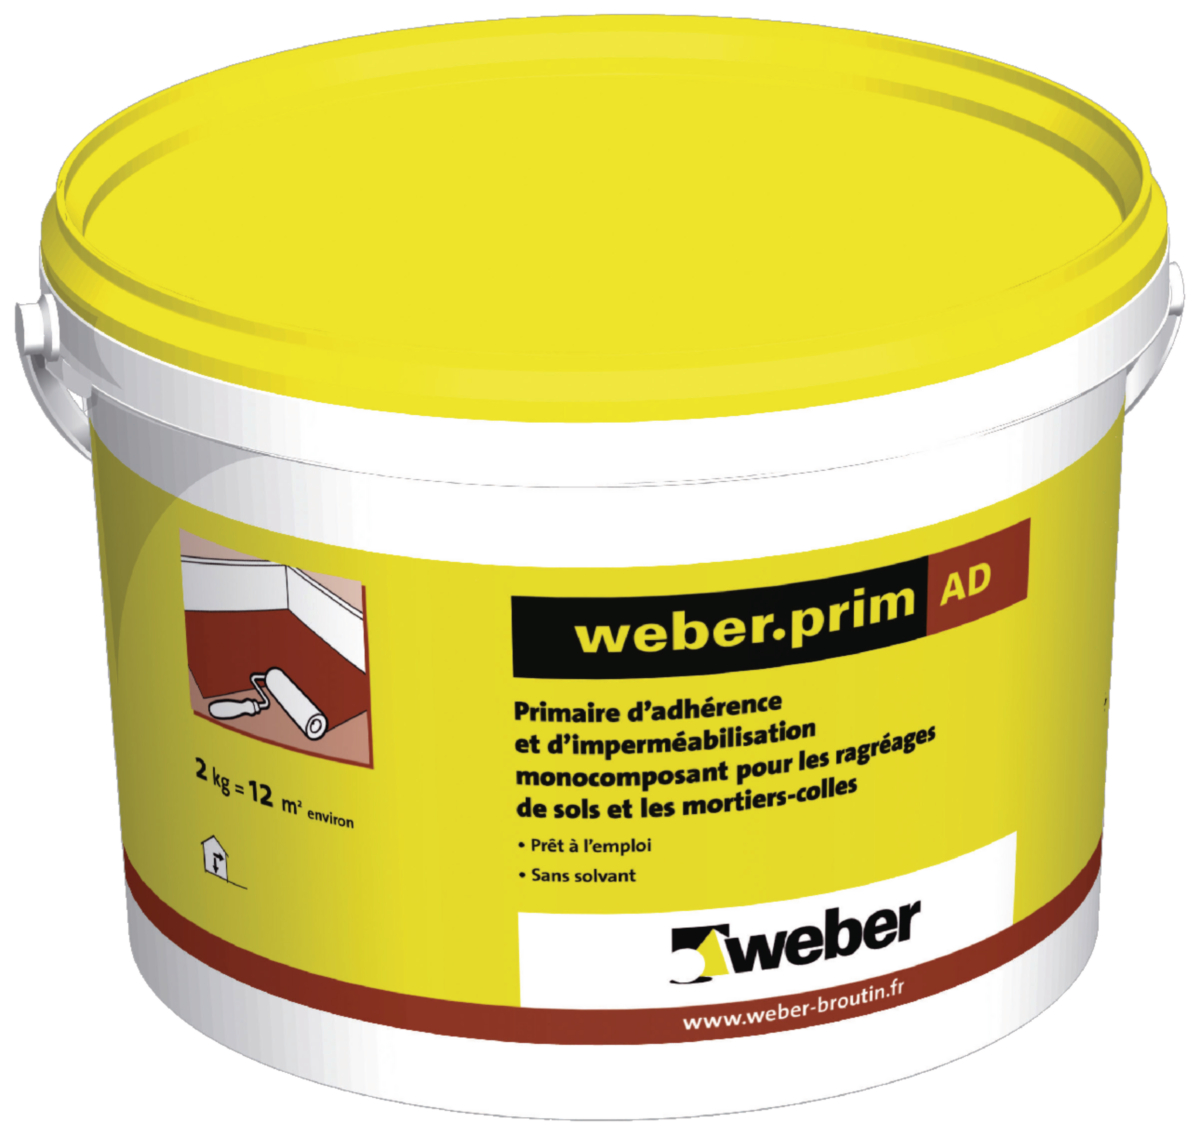 Weber prim ad seau 2kg gu rande 44350 d stockage habitat - Weber prim rp ...